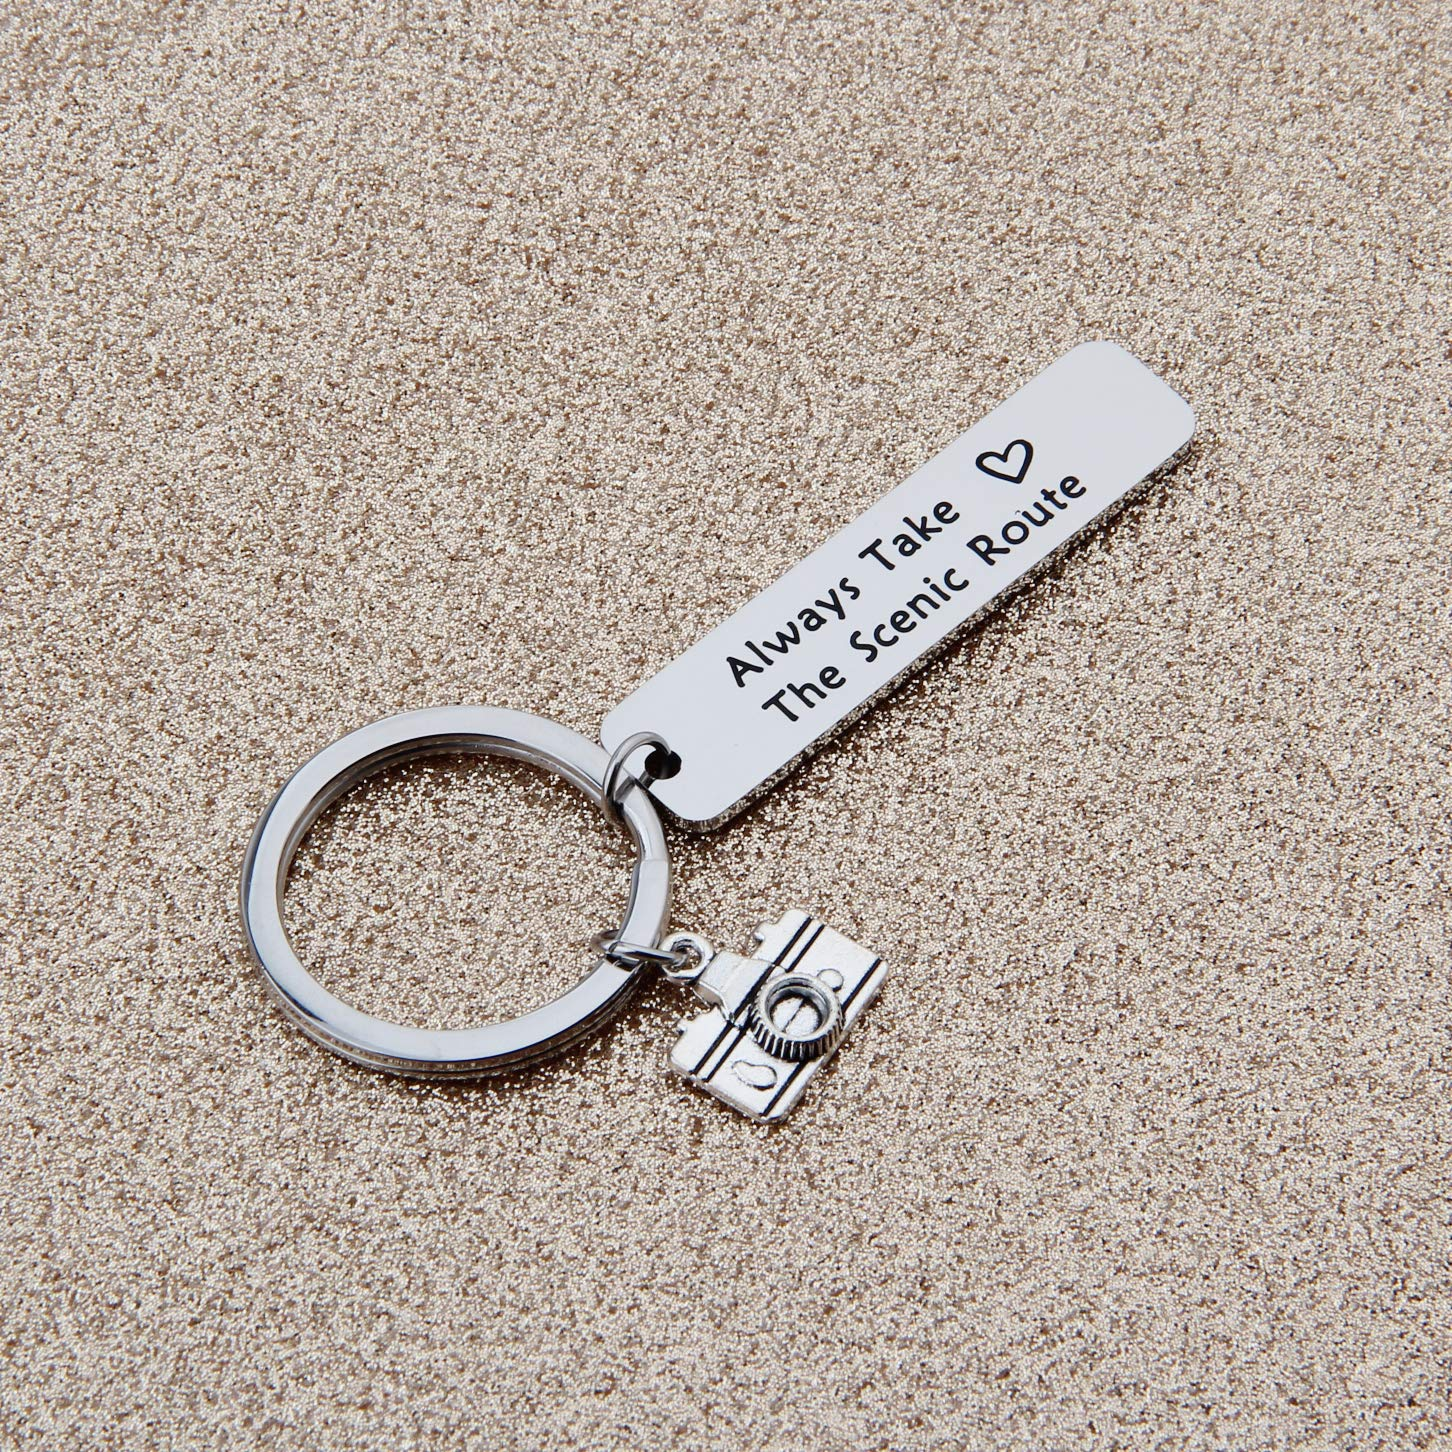 MYOSPARK Photographer Gift Travelers Keychain Adventure Gift Inspirational Jewelry Wanderlust Gift